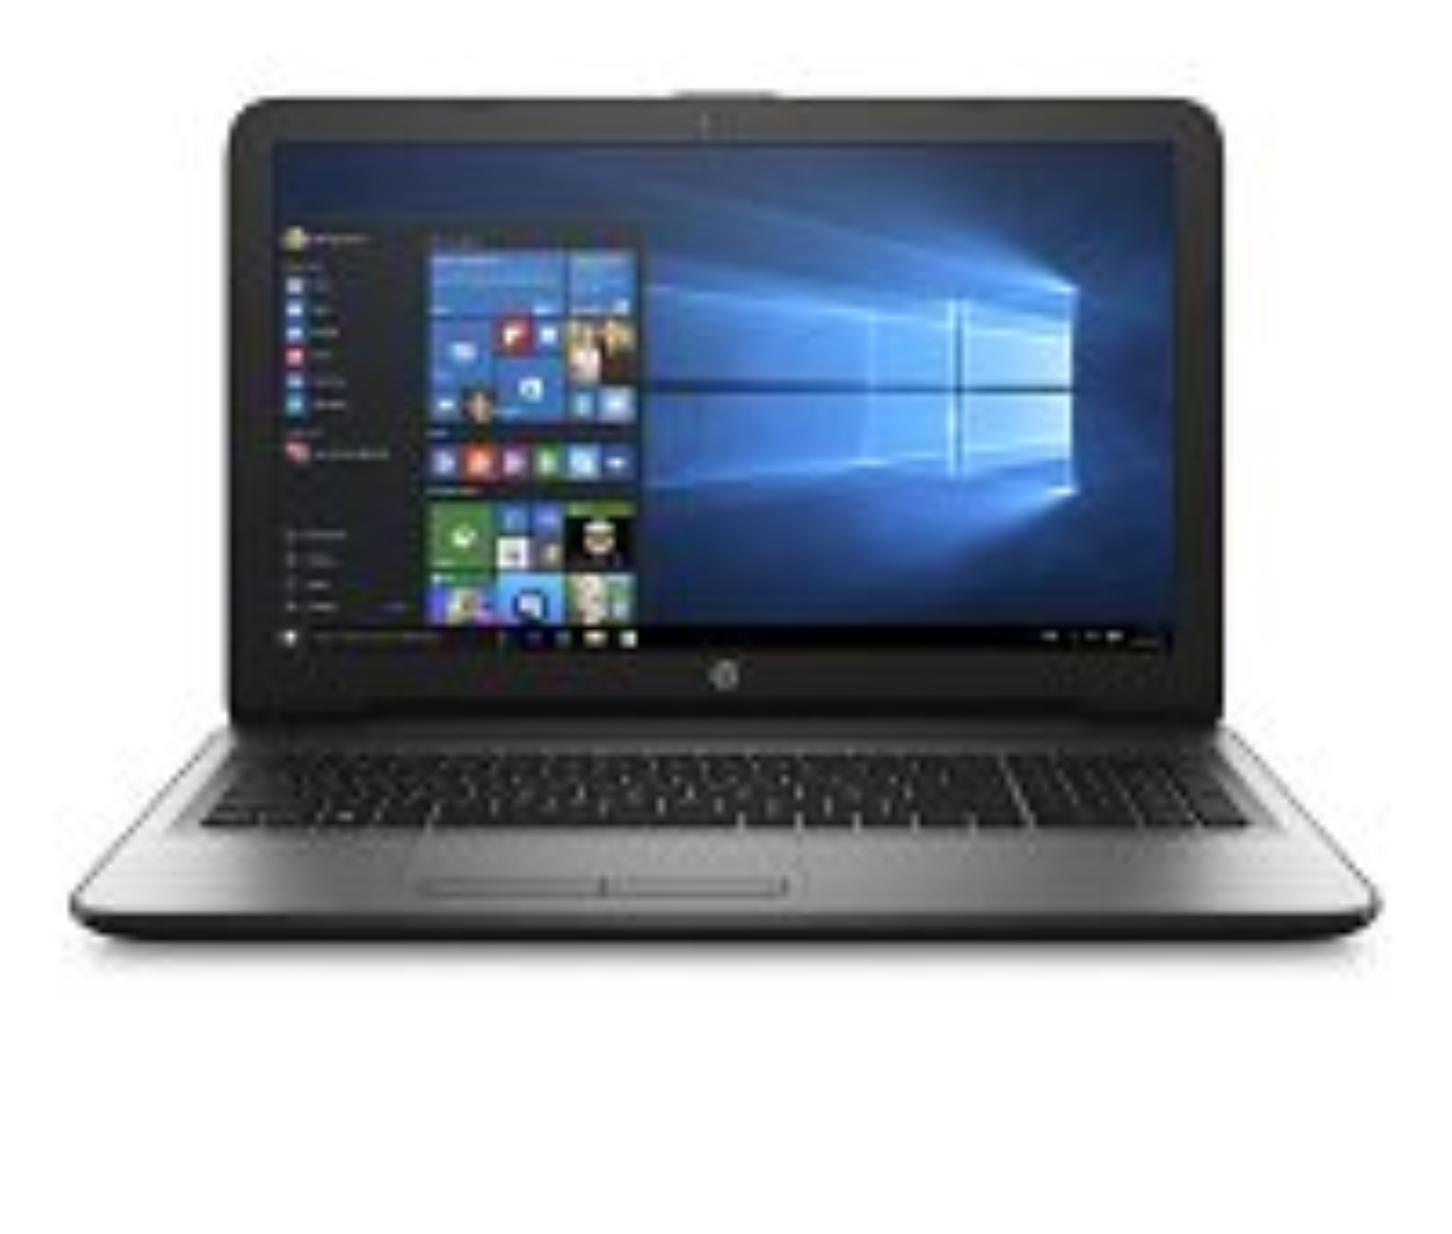 HP 15-ay037nc FHD i5-6200/8GB/1TB/DVD/ATI/2RServis/W10-silver